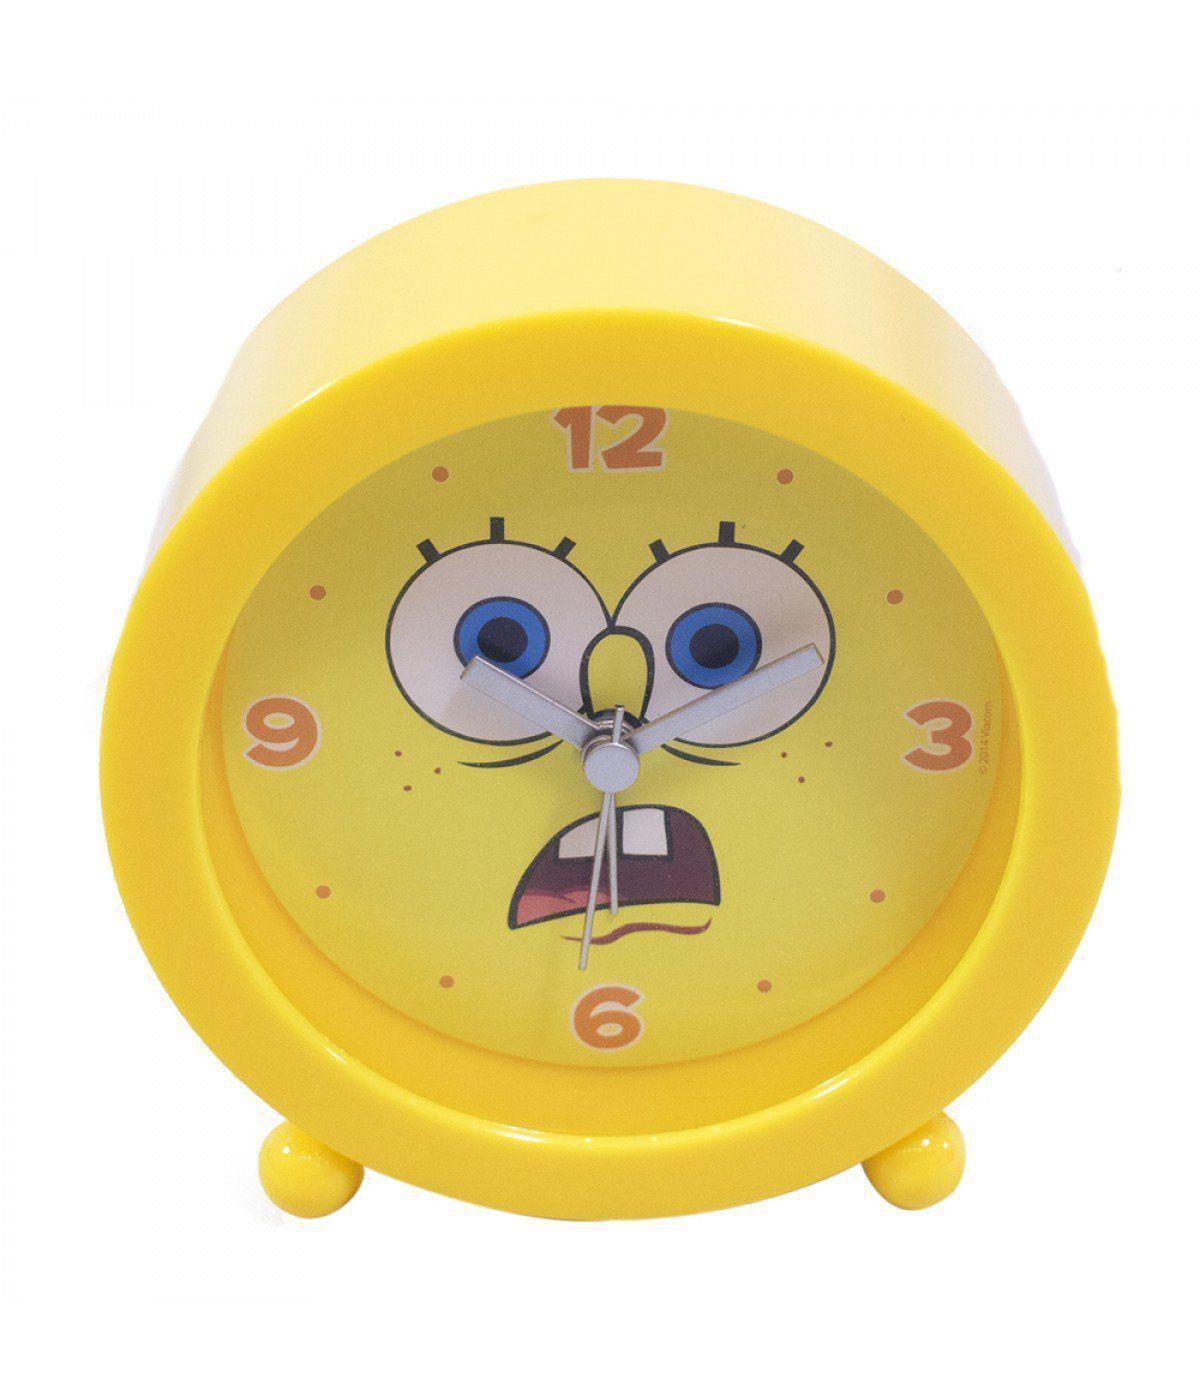 Relógio Despertador Bob Esponja (Assustado): Bob Esponja